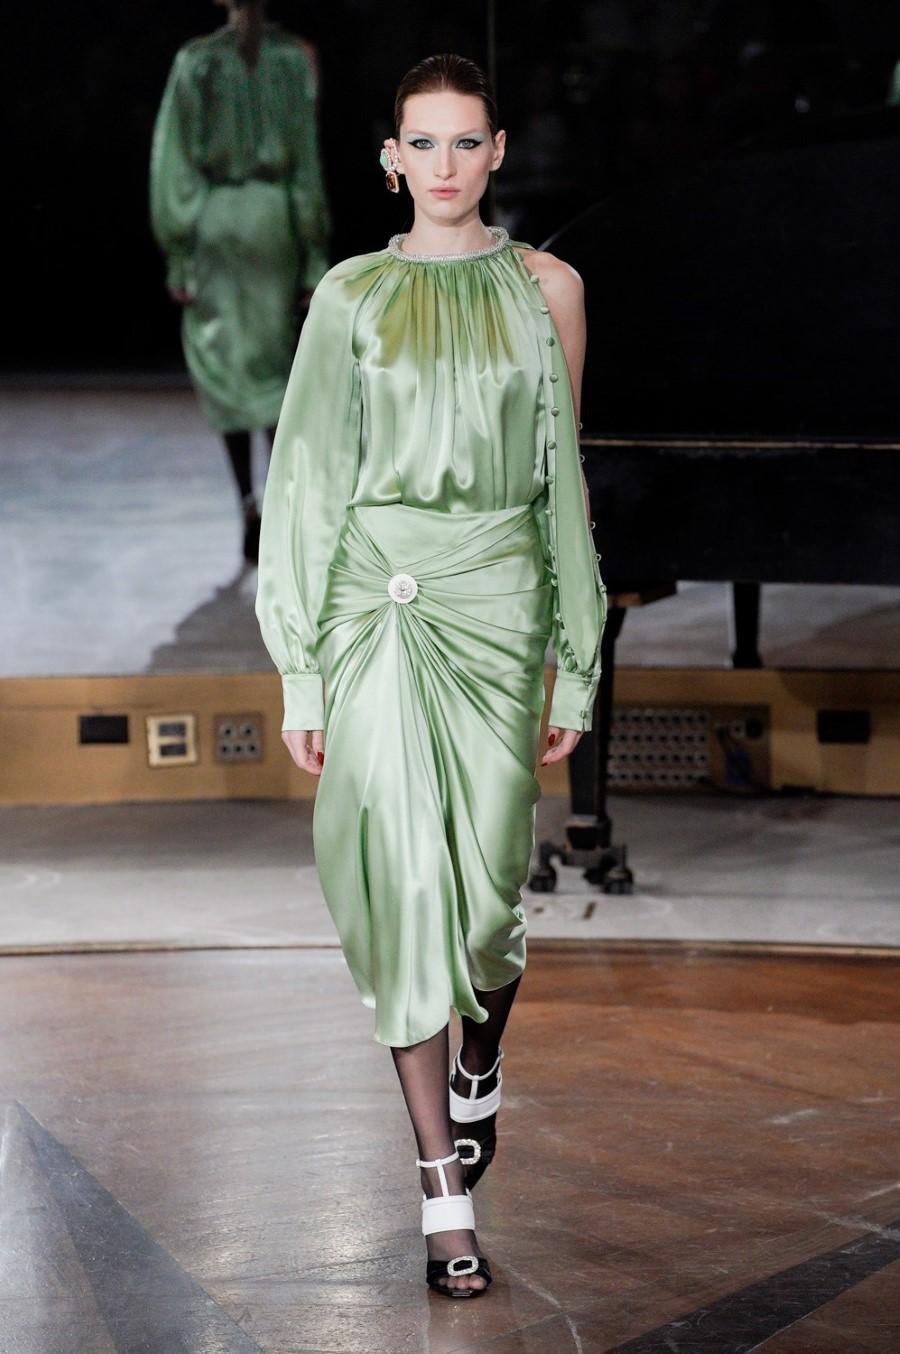 Prabal Gurung - Fall Winter 2020 - New York Fashion WeekPrabal Gurung - Fall Winter 2020 - New York Fashion Week